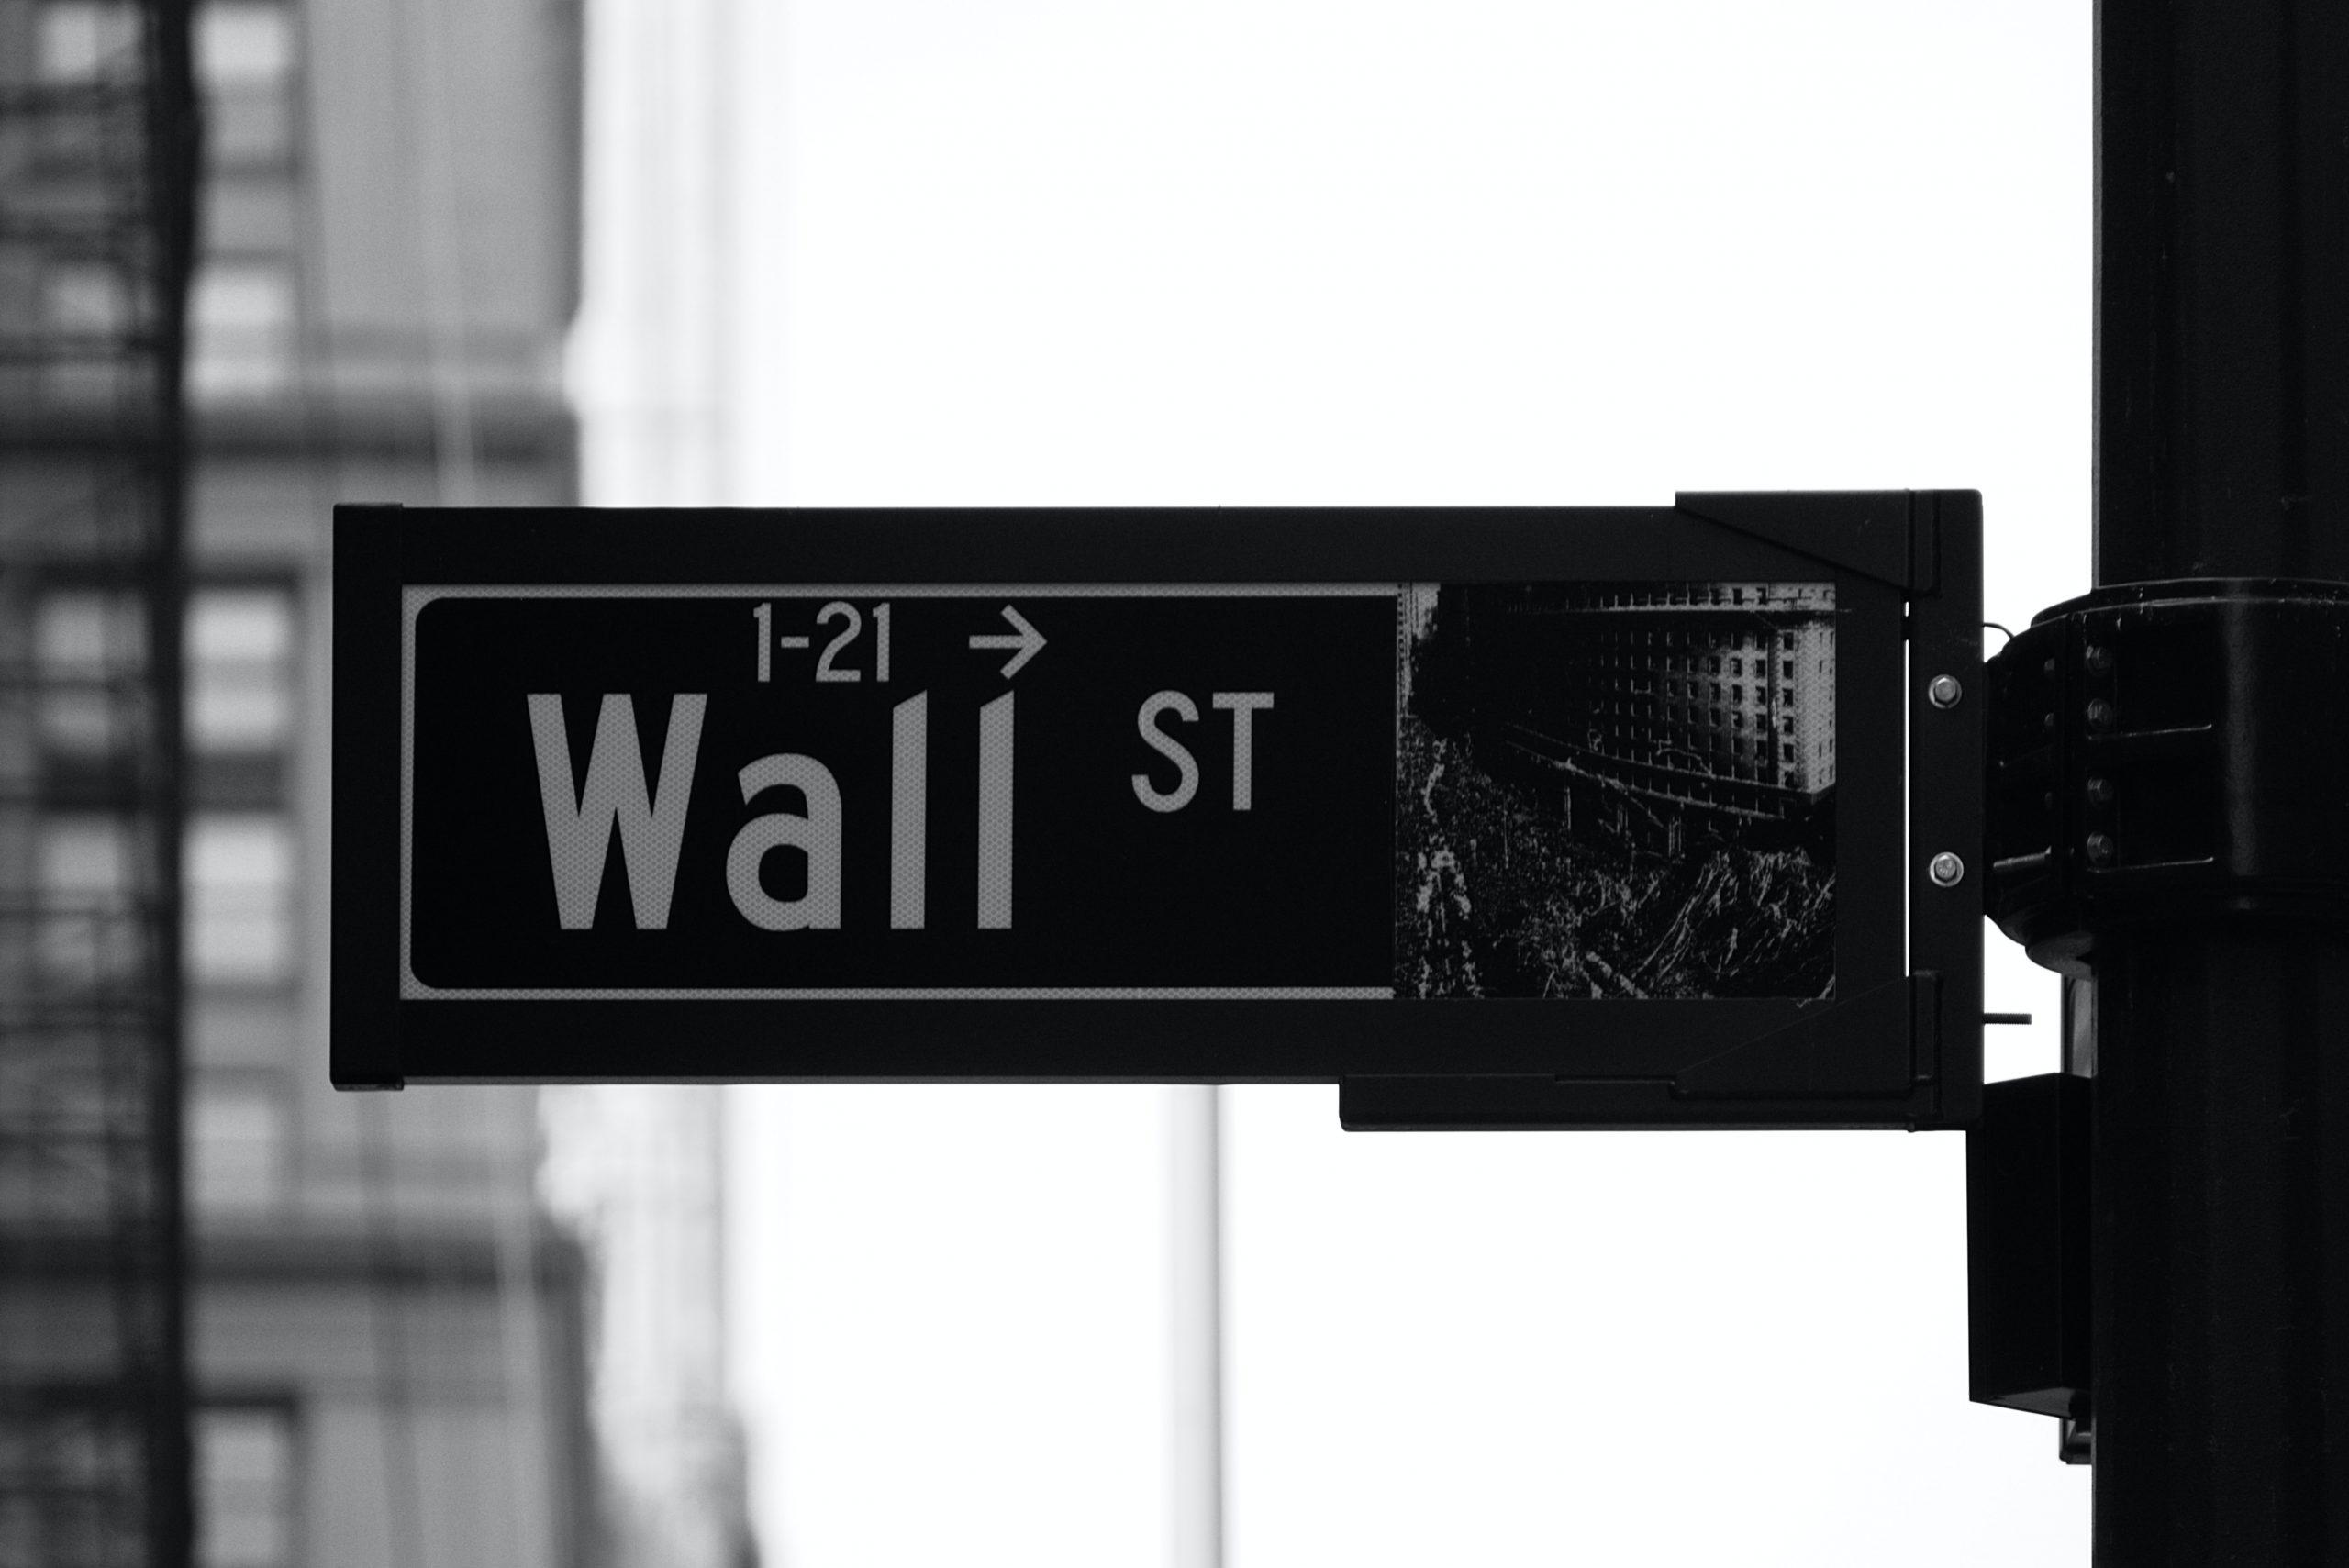 Stock Market Revenues Decrease Across All Markets